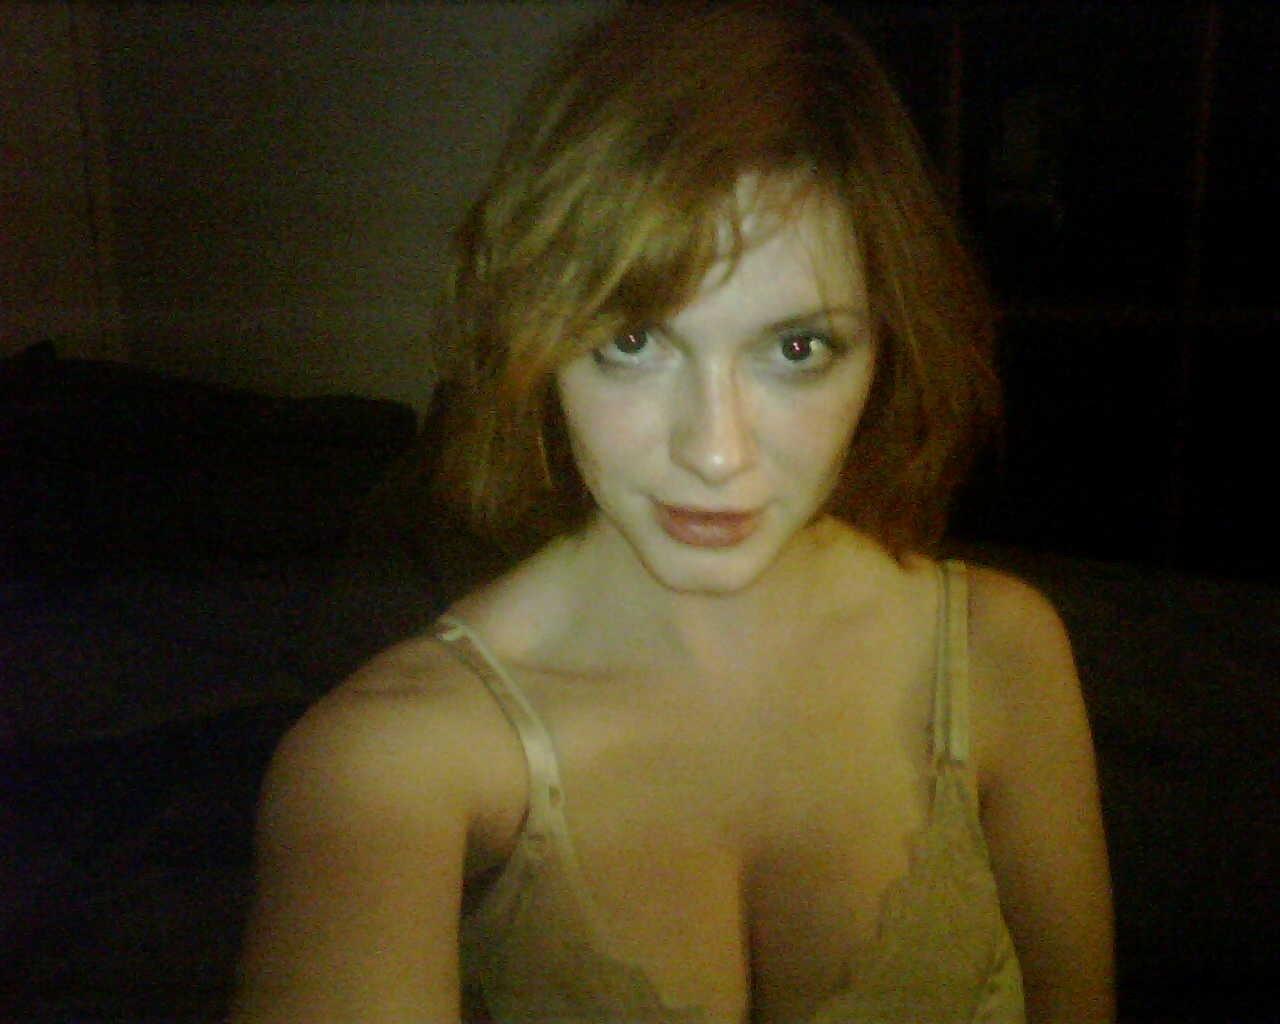 Christina Hendricks Twitter Pictures Picx